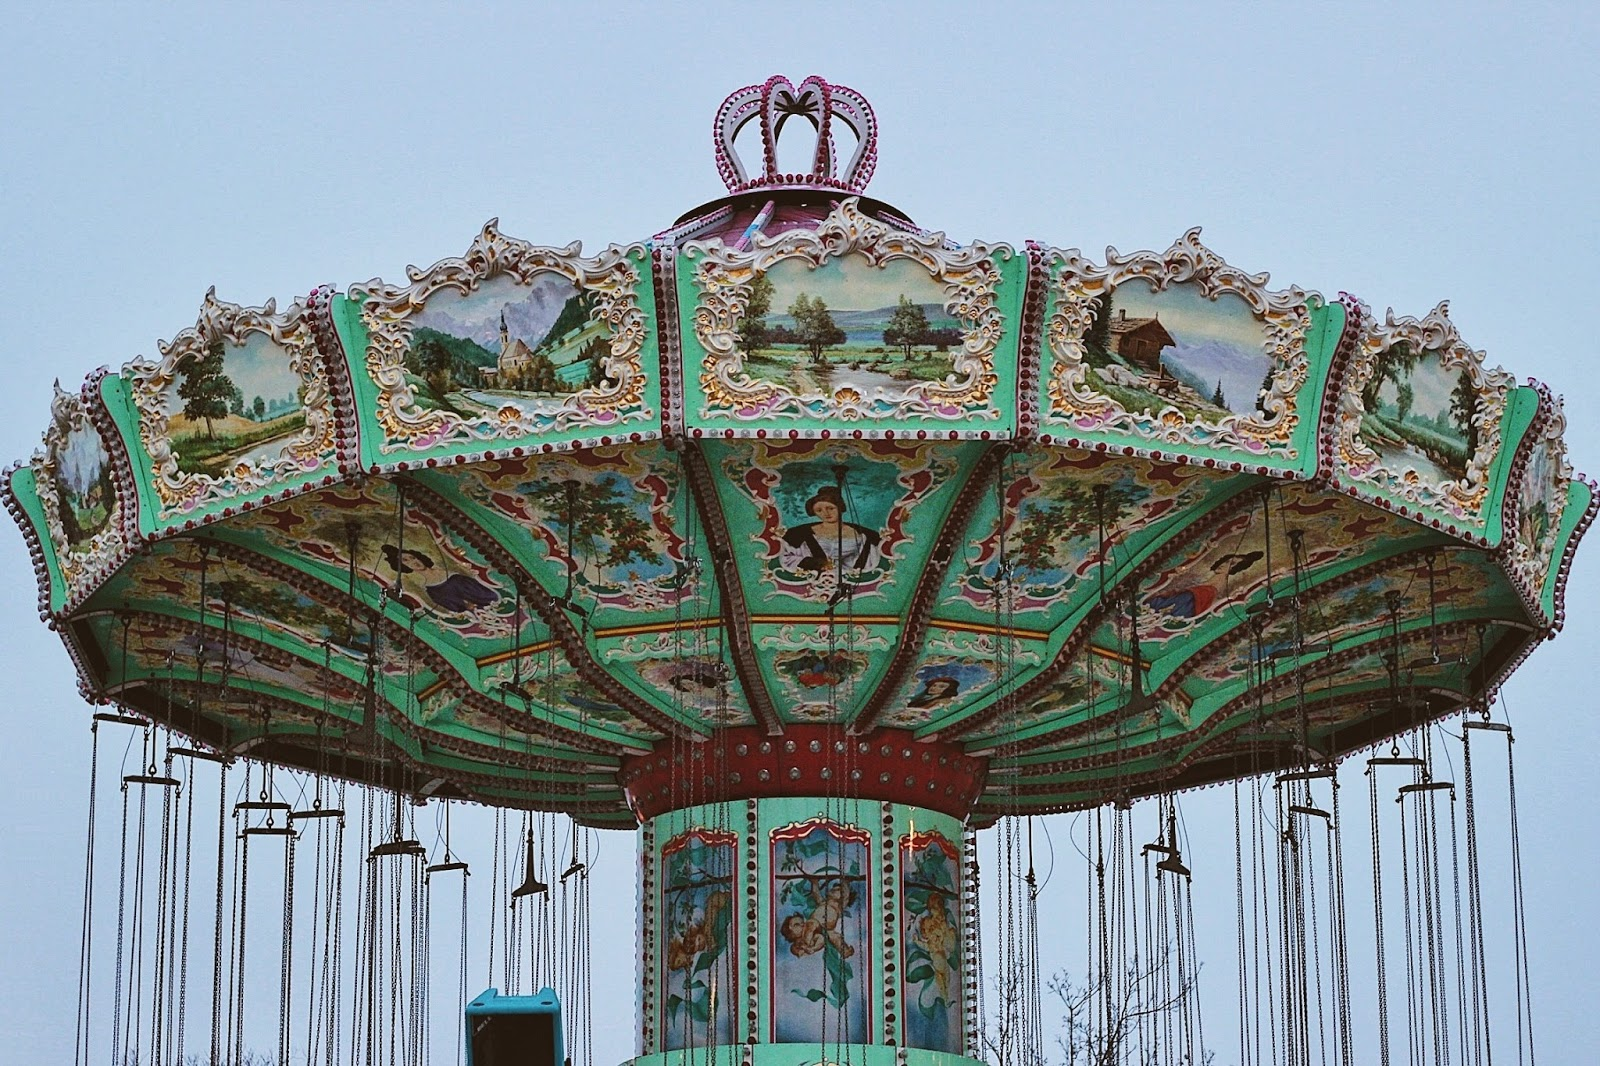 lifesthayle-vienna-prater-carousel-details.jpg